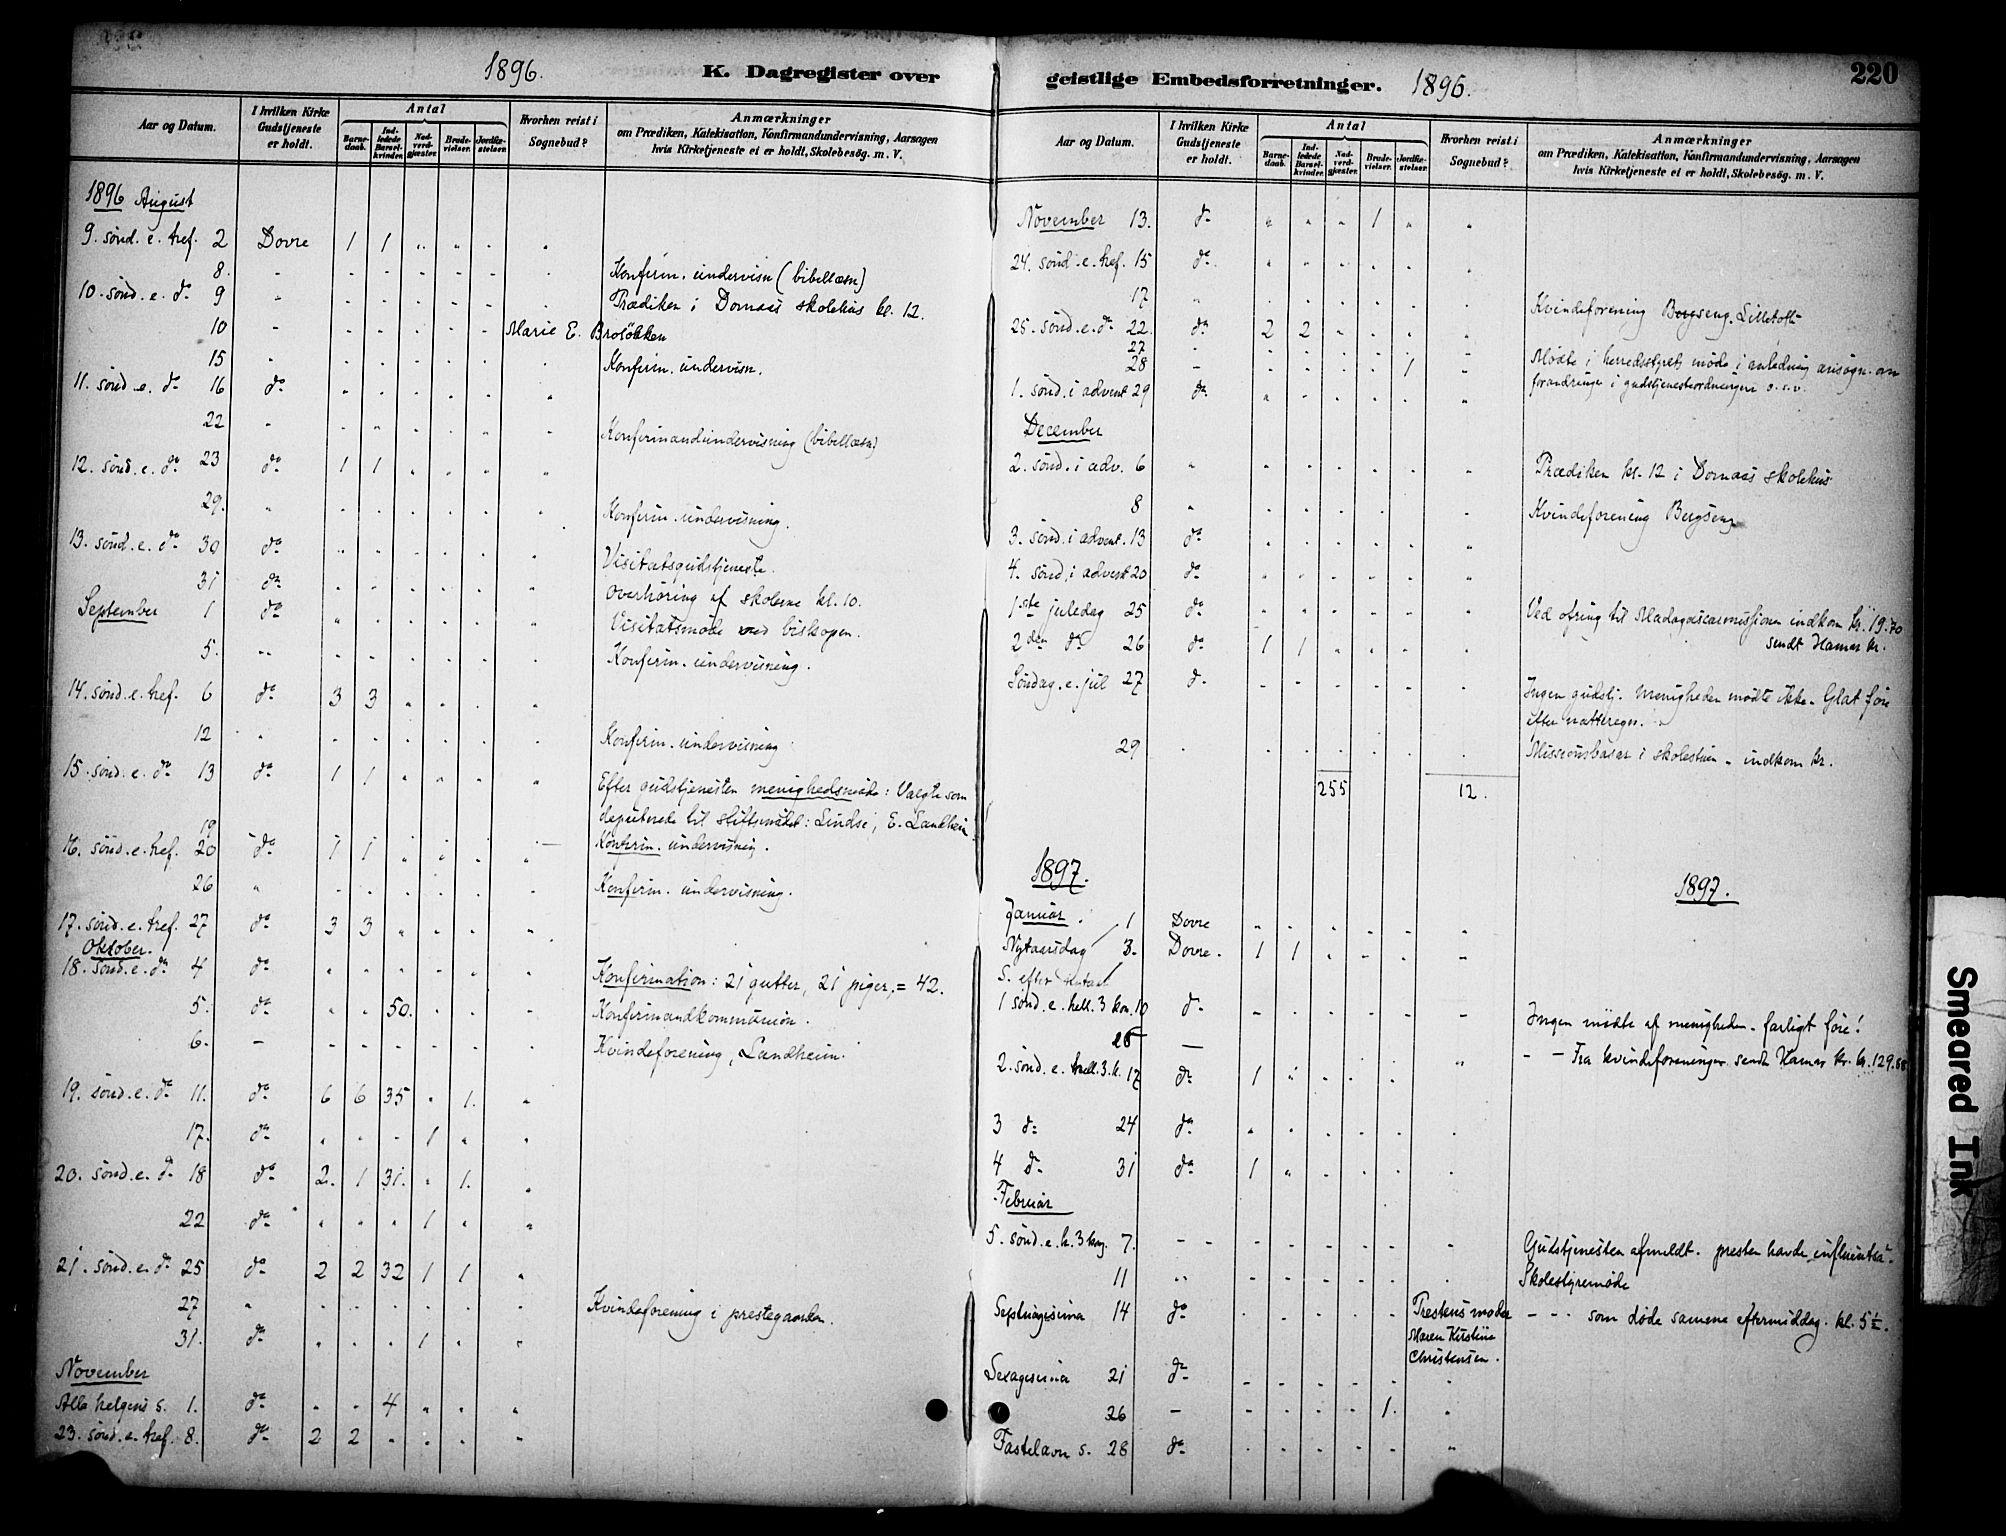 SAH, Dovre prestekontor, Ministerialbok nr. 3, 1891-1901, s. 220